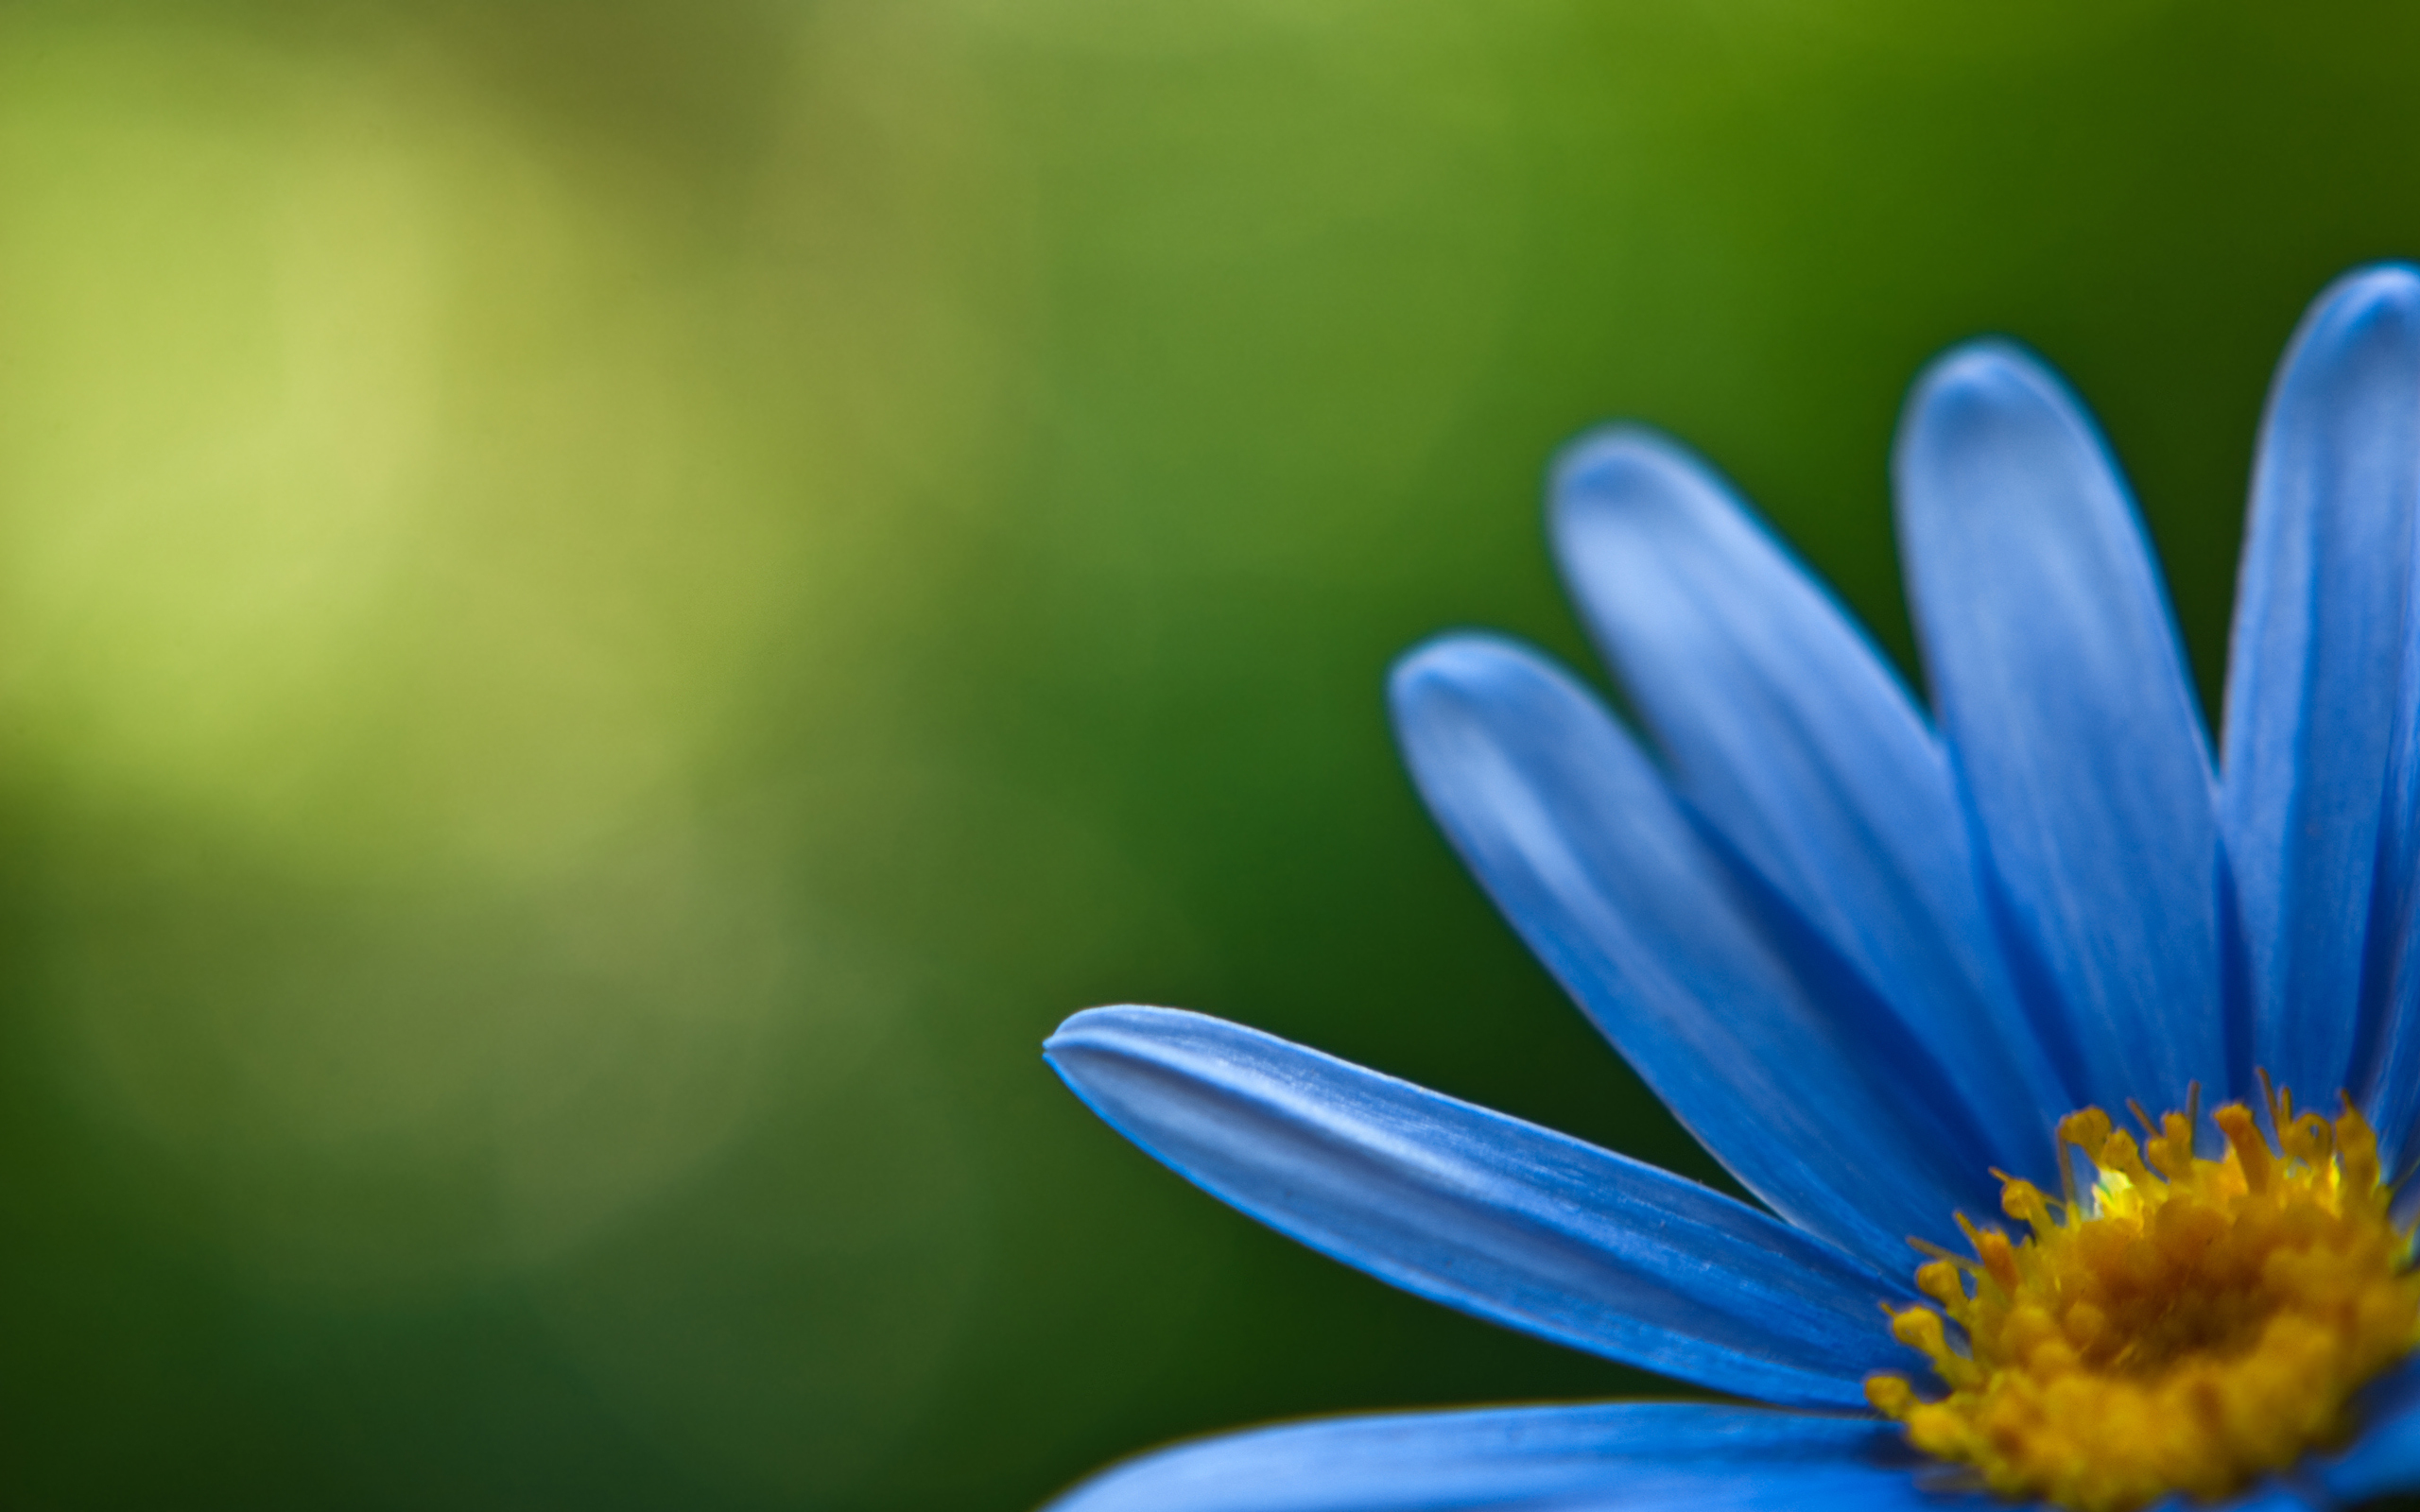 Blue Flower HD Wallpapers 2560x1600